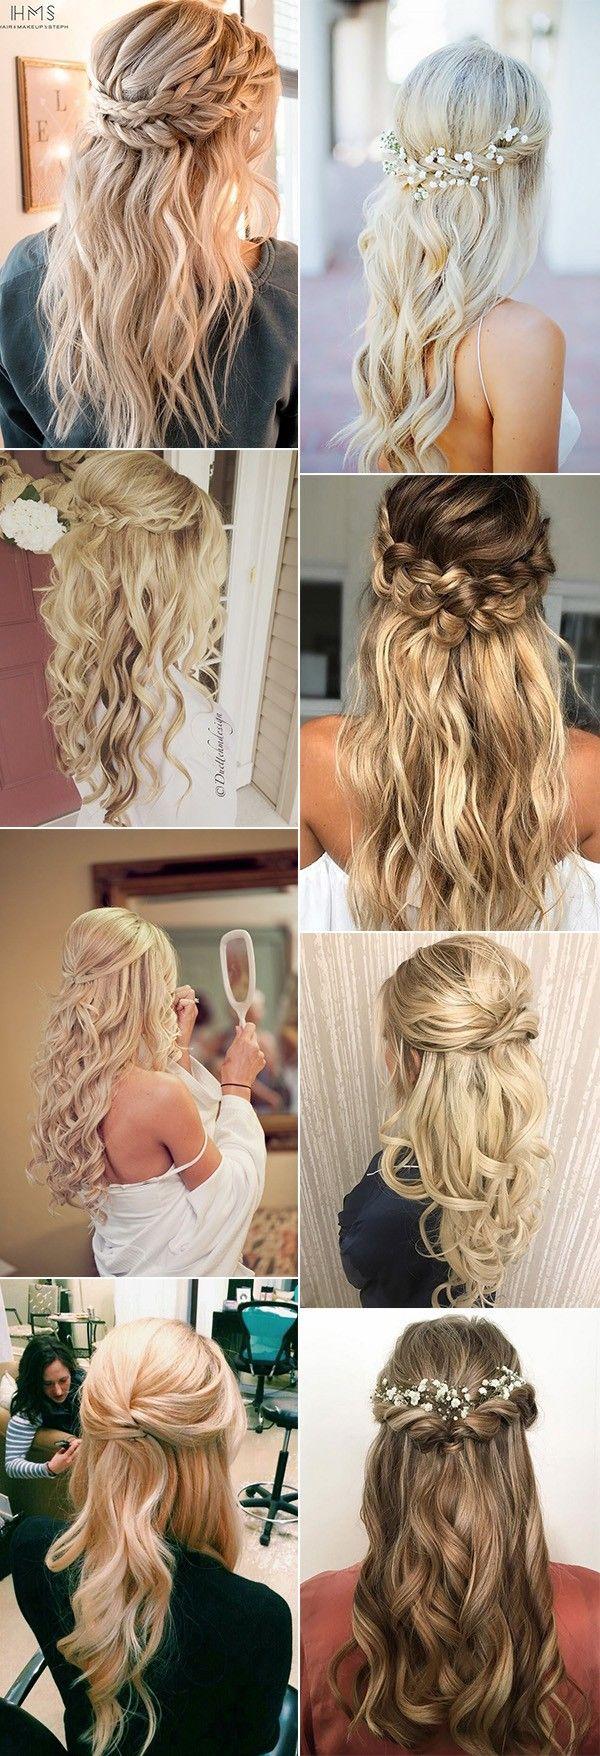 best sophie hair images on pinterest hair ideas hair makeup